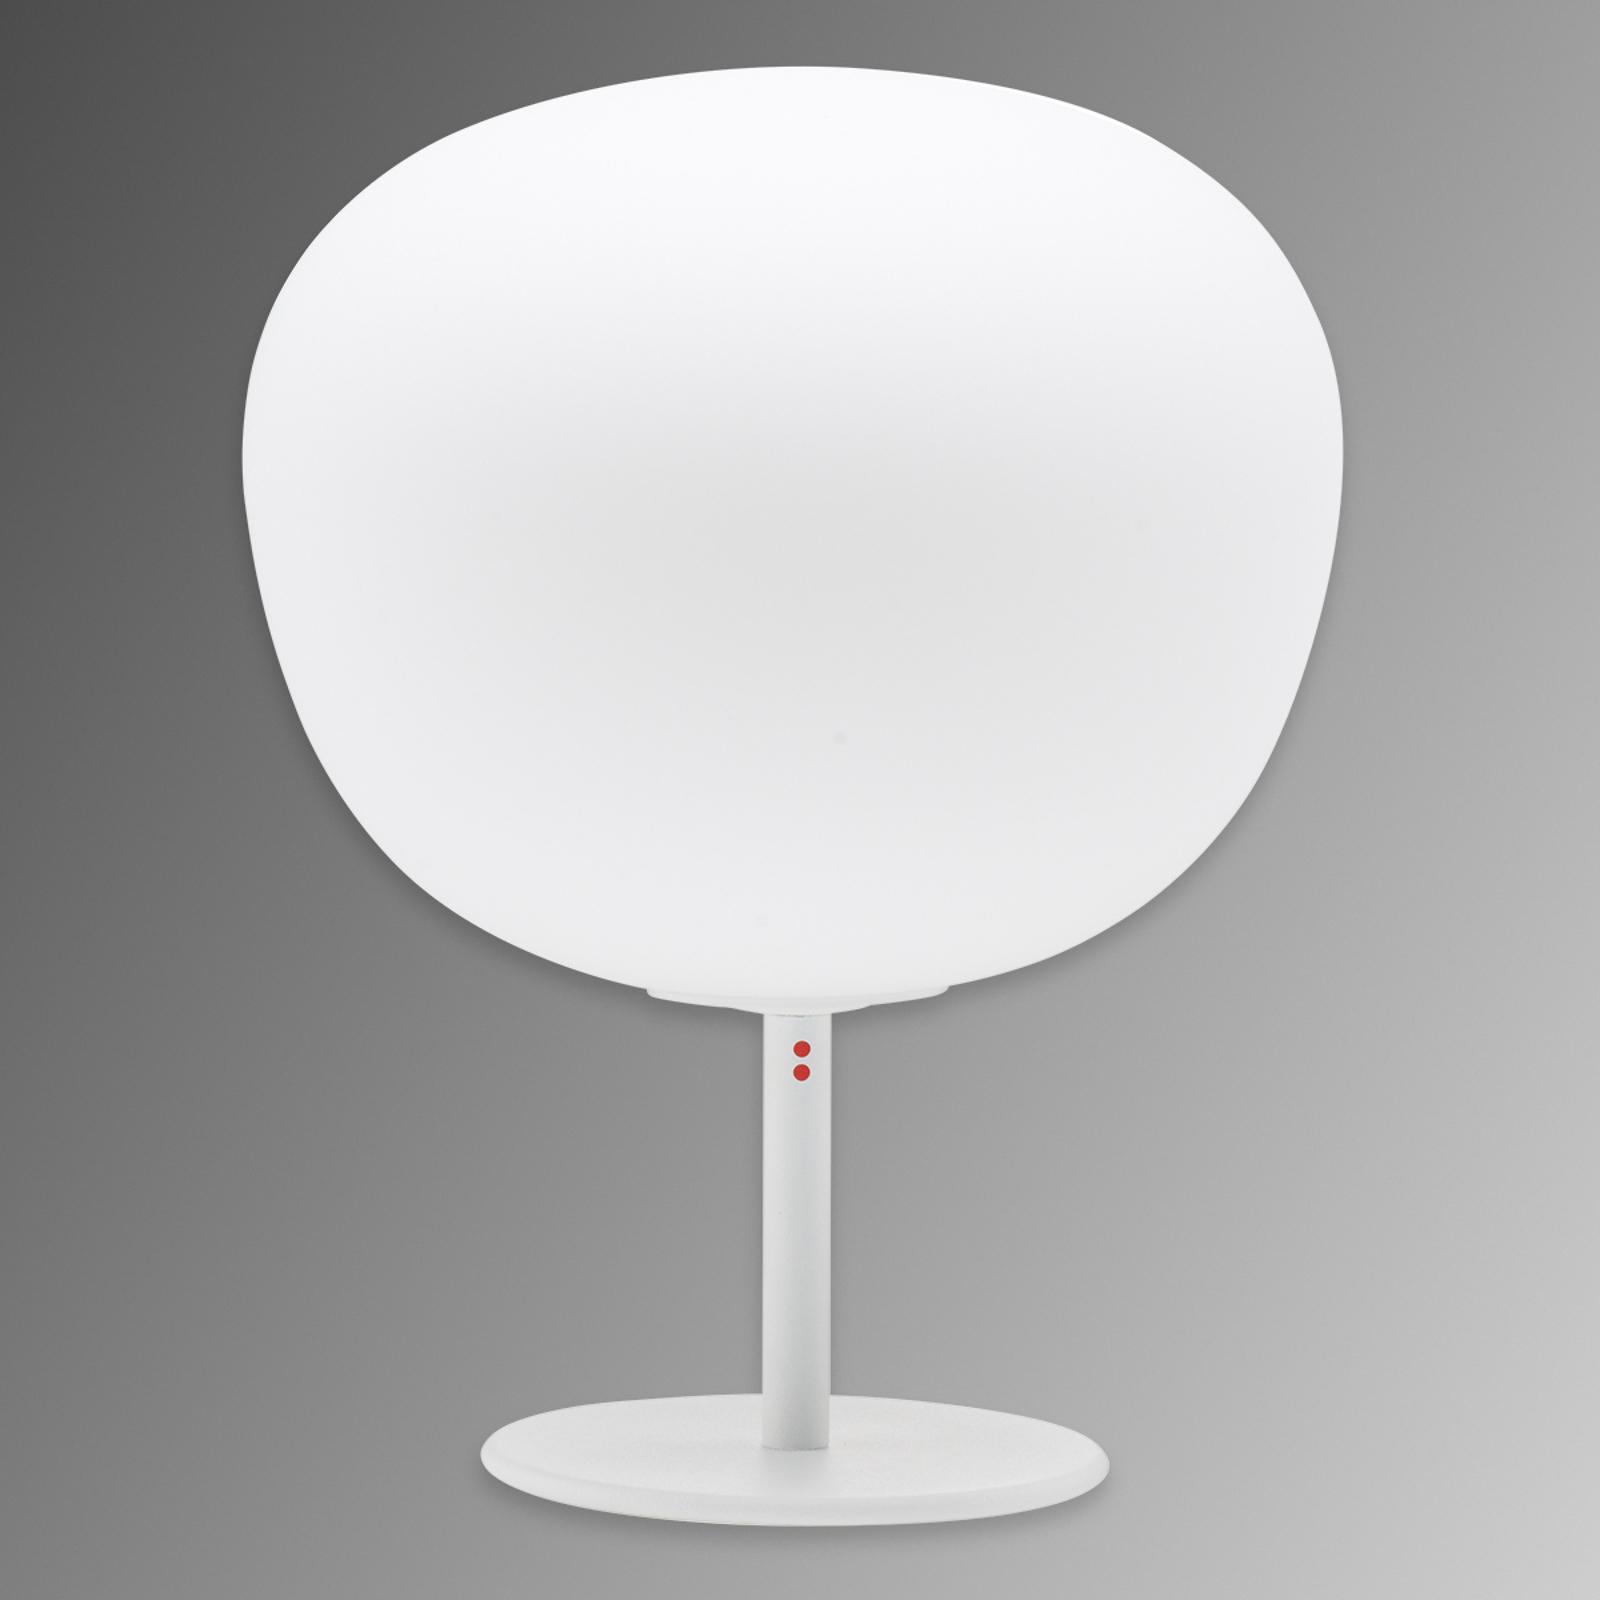 Decoratieve tafellamp MOCHI 20 cm